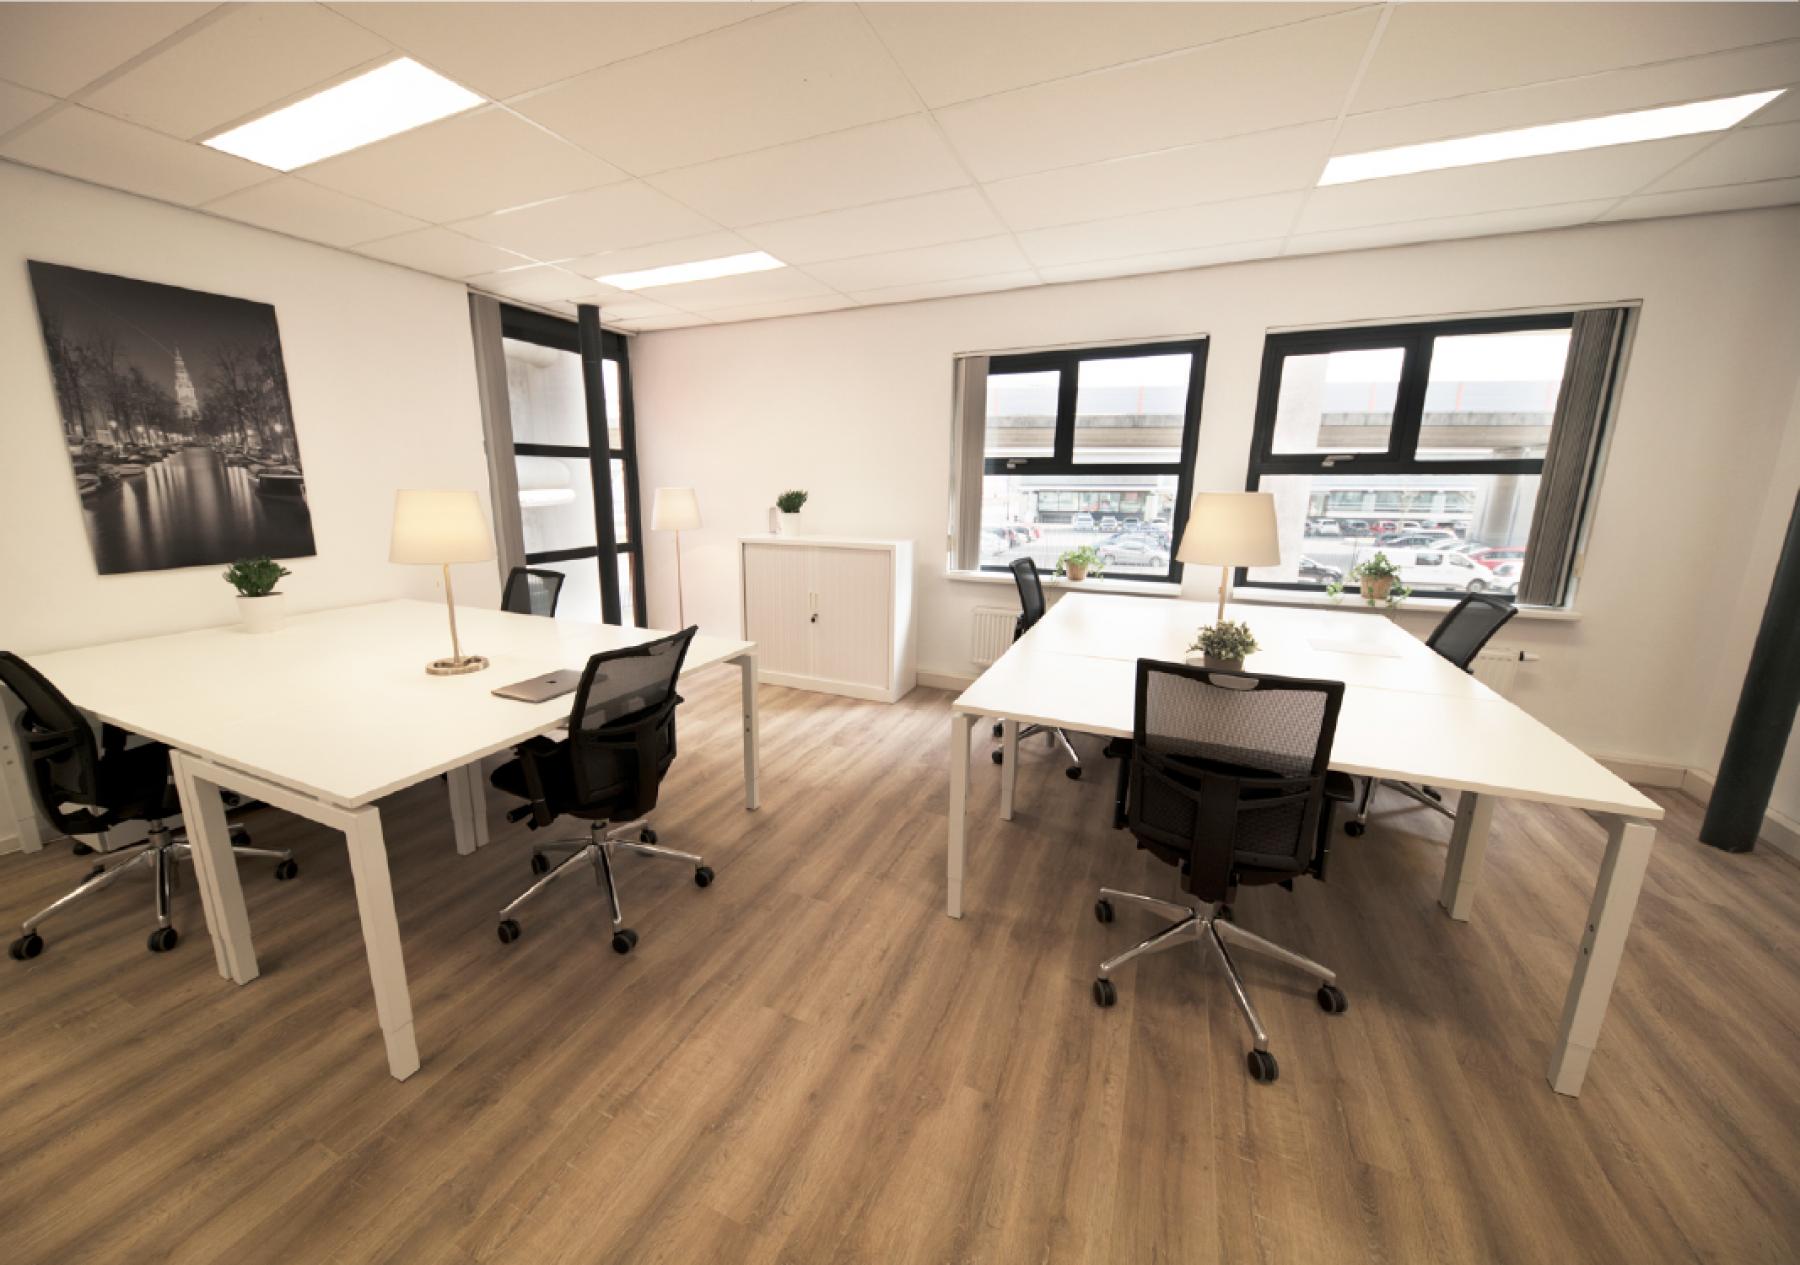 Office space at the Arlandaweg